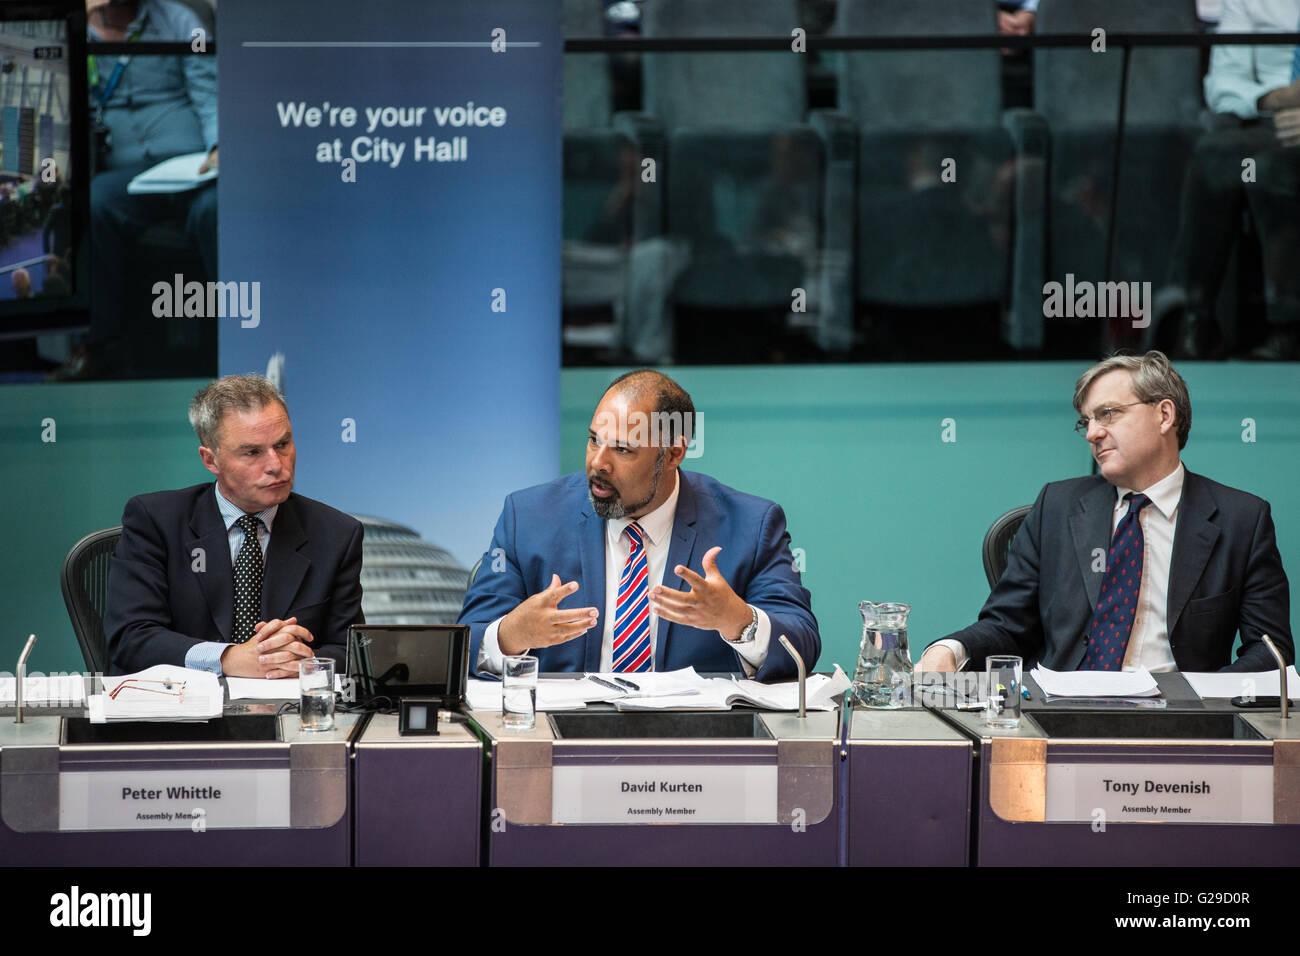 London, UK. 25th May, 2016. London Assembly Members Peter Whittle (UK Independence Party), David Kurten (UK Independence - Stock Image